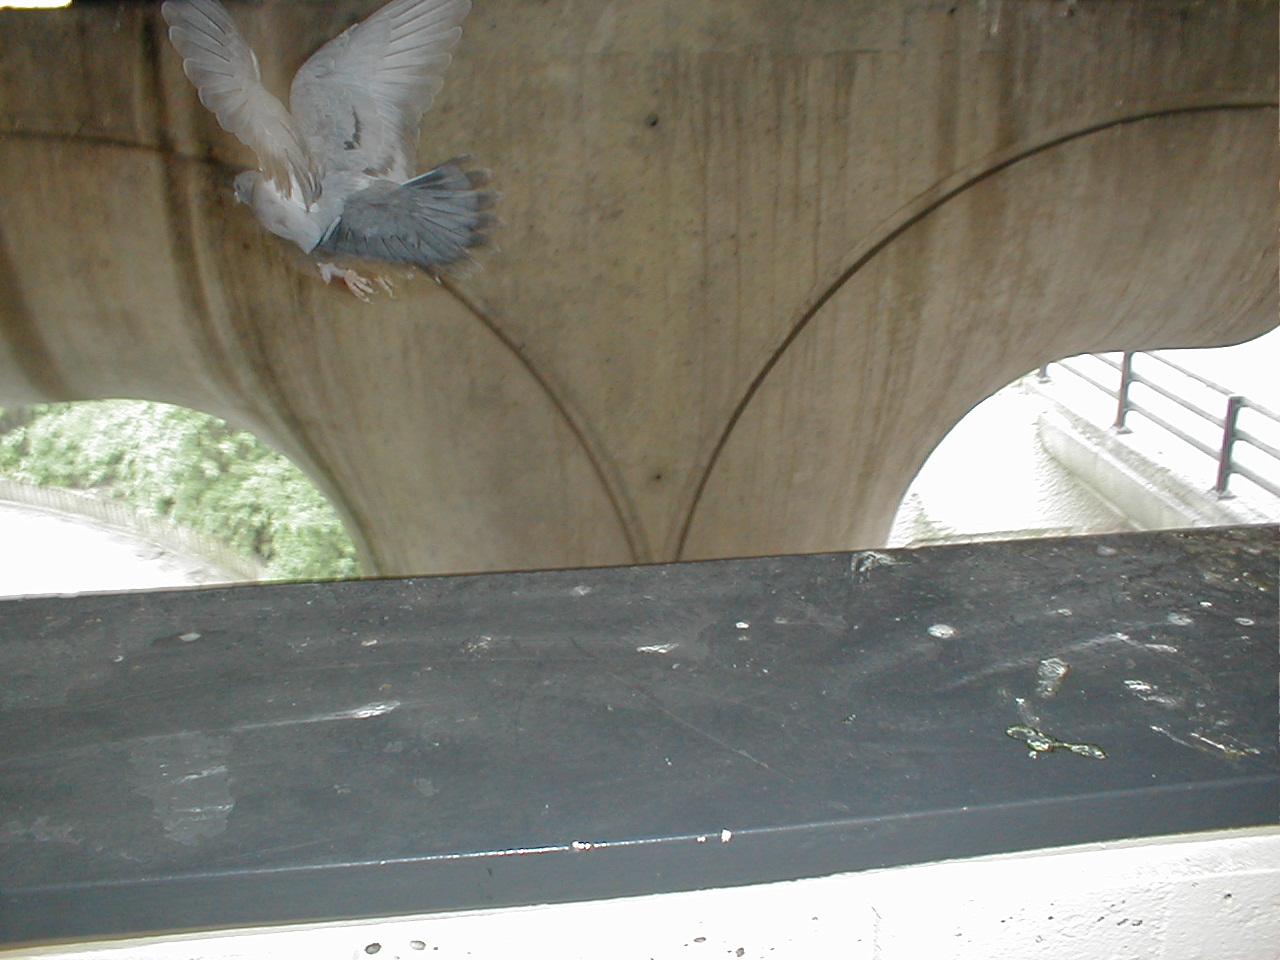 dario pigeon bird flying away scared startled